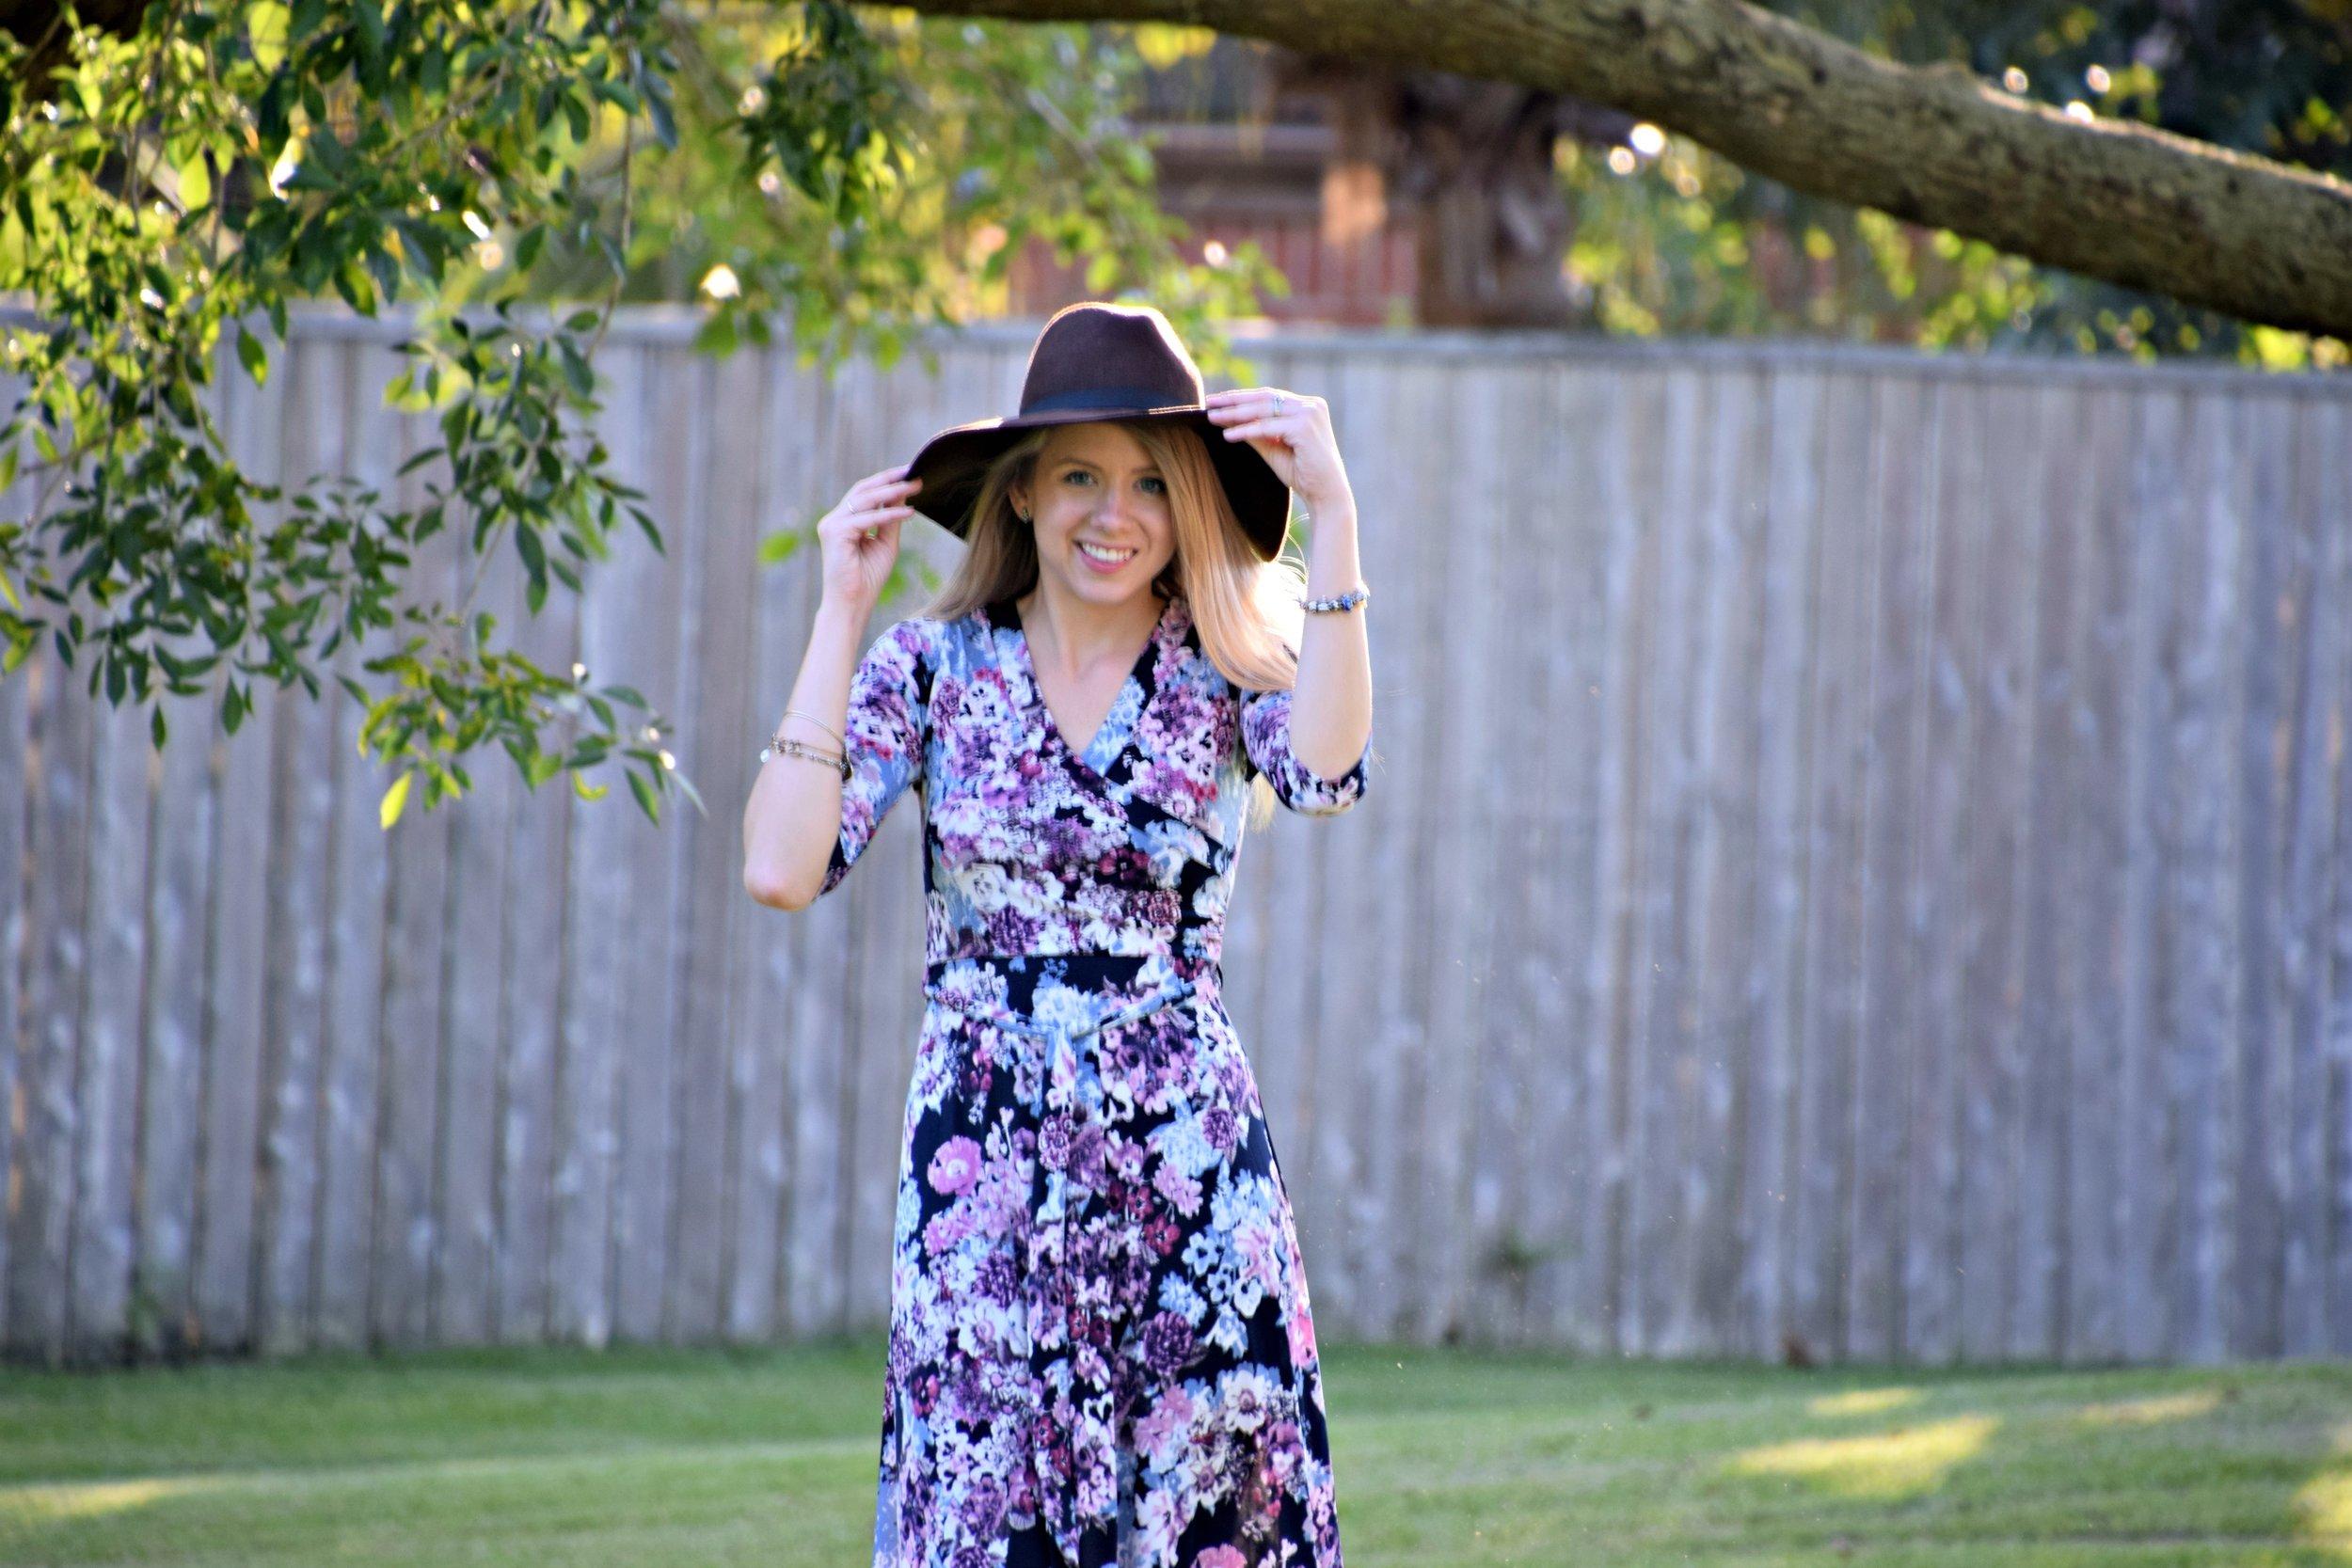 Fall Dresses 2017 - Houston Lifestyle Blogger.jpg